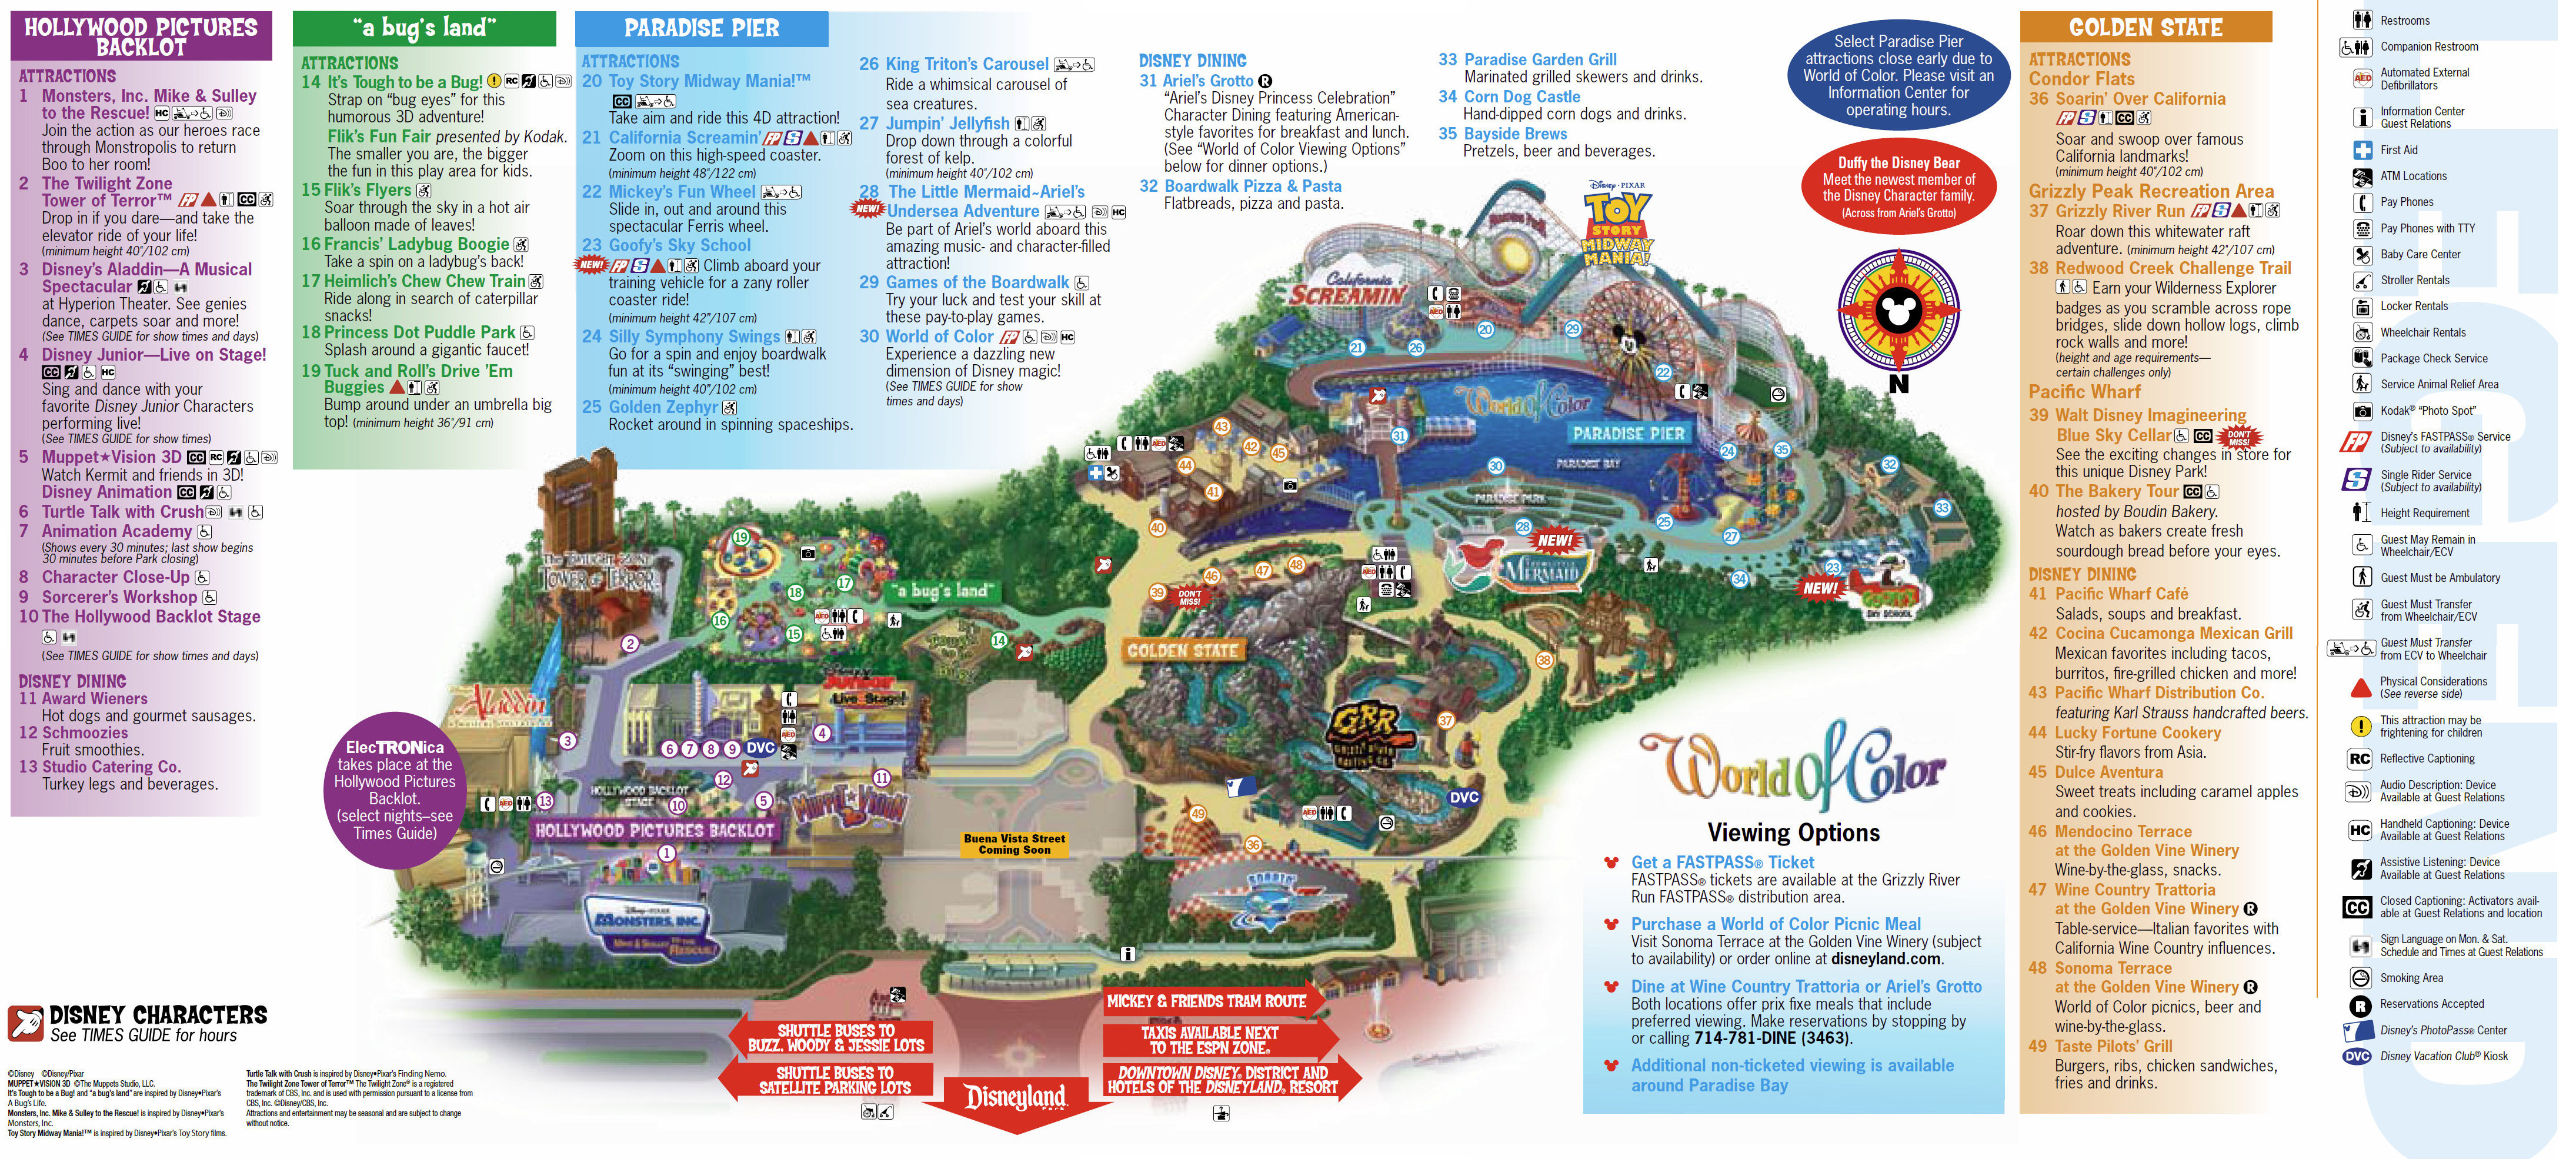 Disneyland California Adventure Map From Hetbestevooruwknaagdier 4 - Disneyland California Map